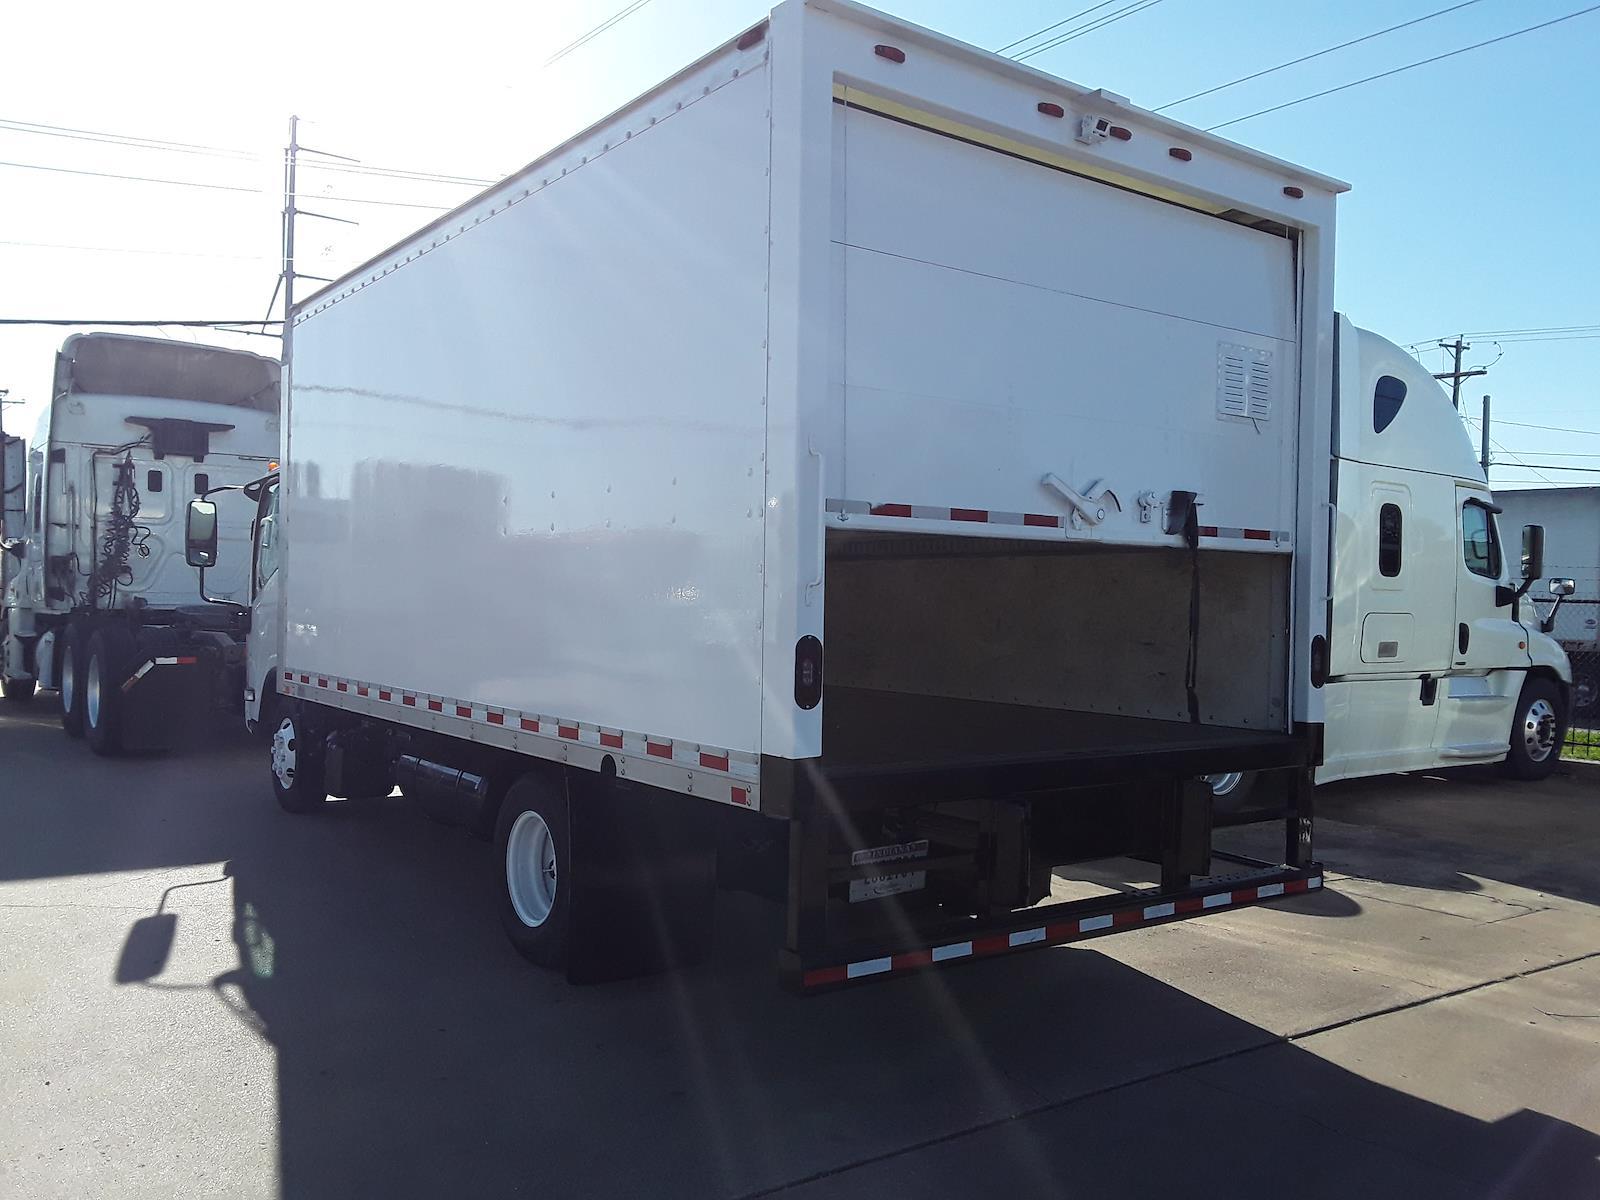 2016 Isuzu NPR Regular Cab 4x2, Dry Freight #670833 - photo 1